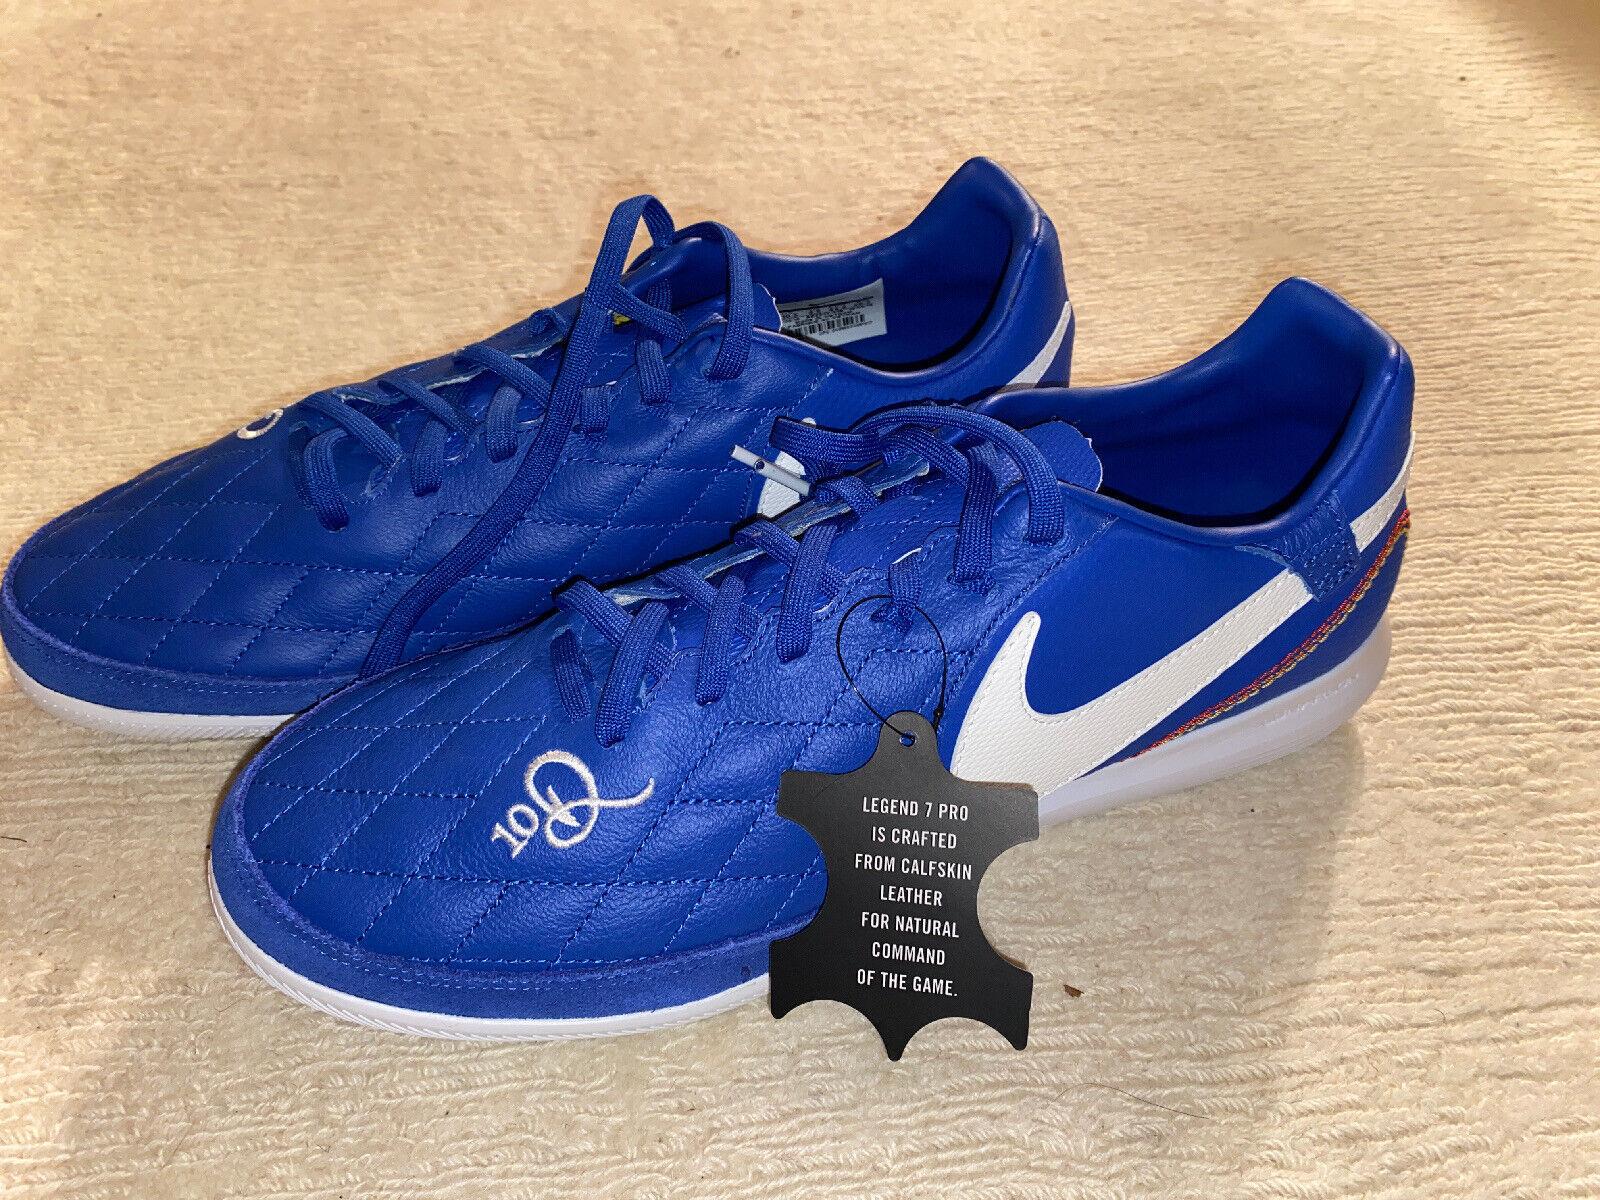 Nike Tiempo Legend VII Elite FG R10 Ronaldinho US Size 11.5 for sale online